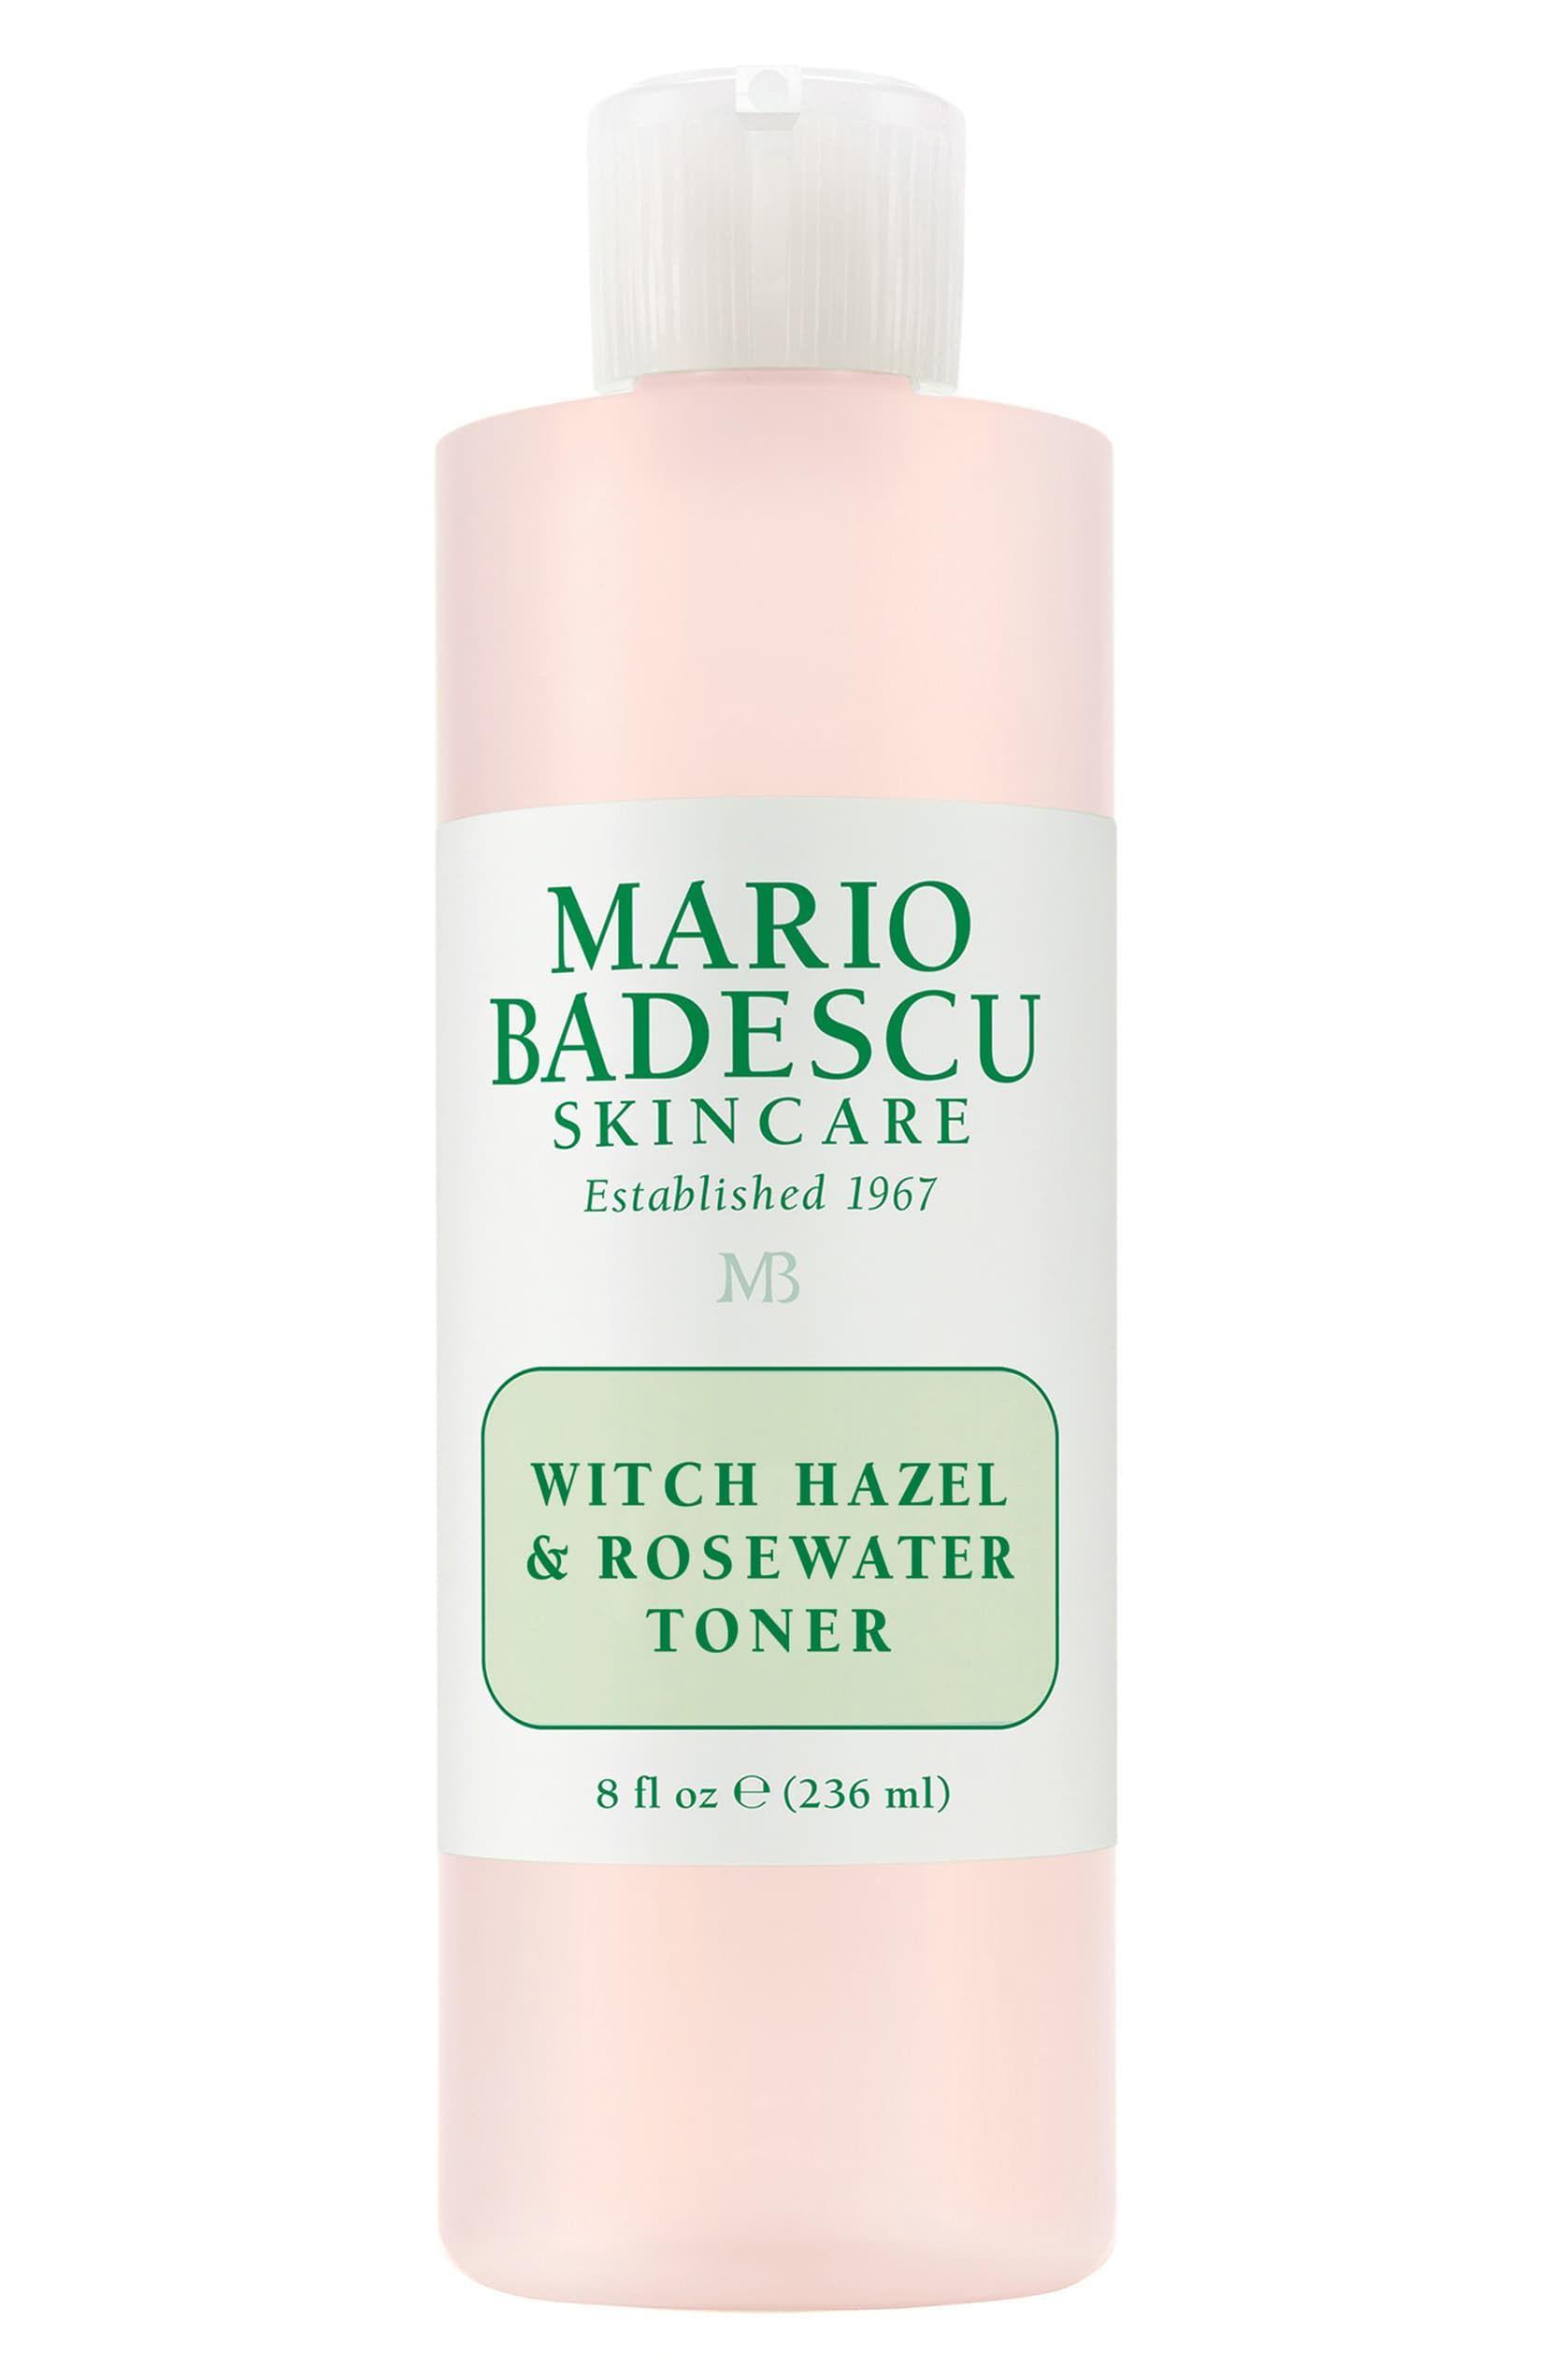 Witch Hazel Rosewater Toner In 2020 Rose Water Toner Skin Care Mario Badescu